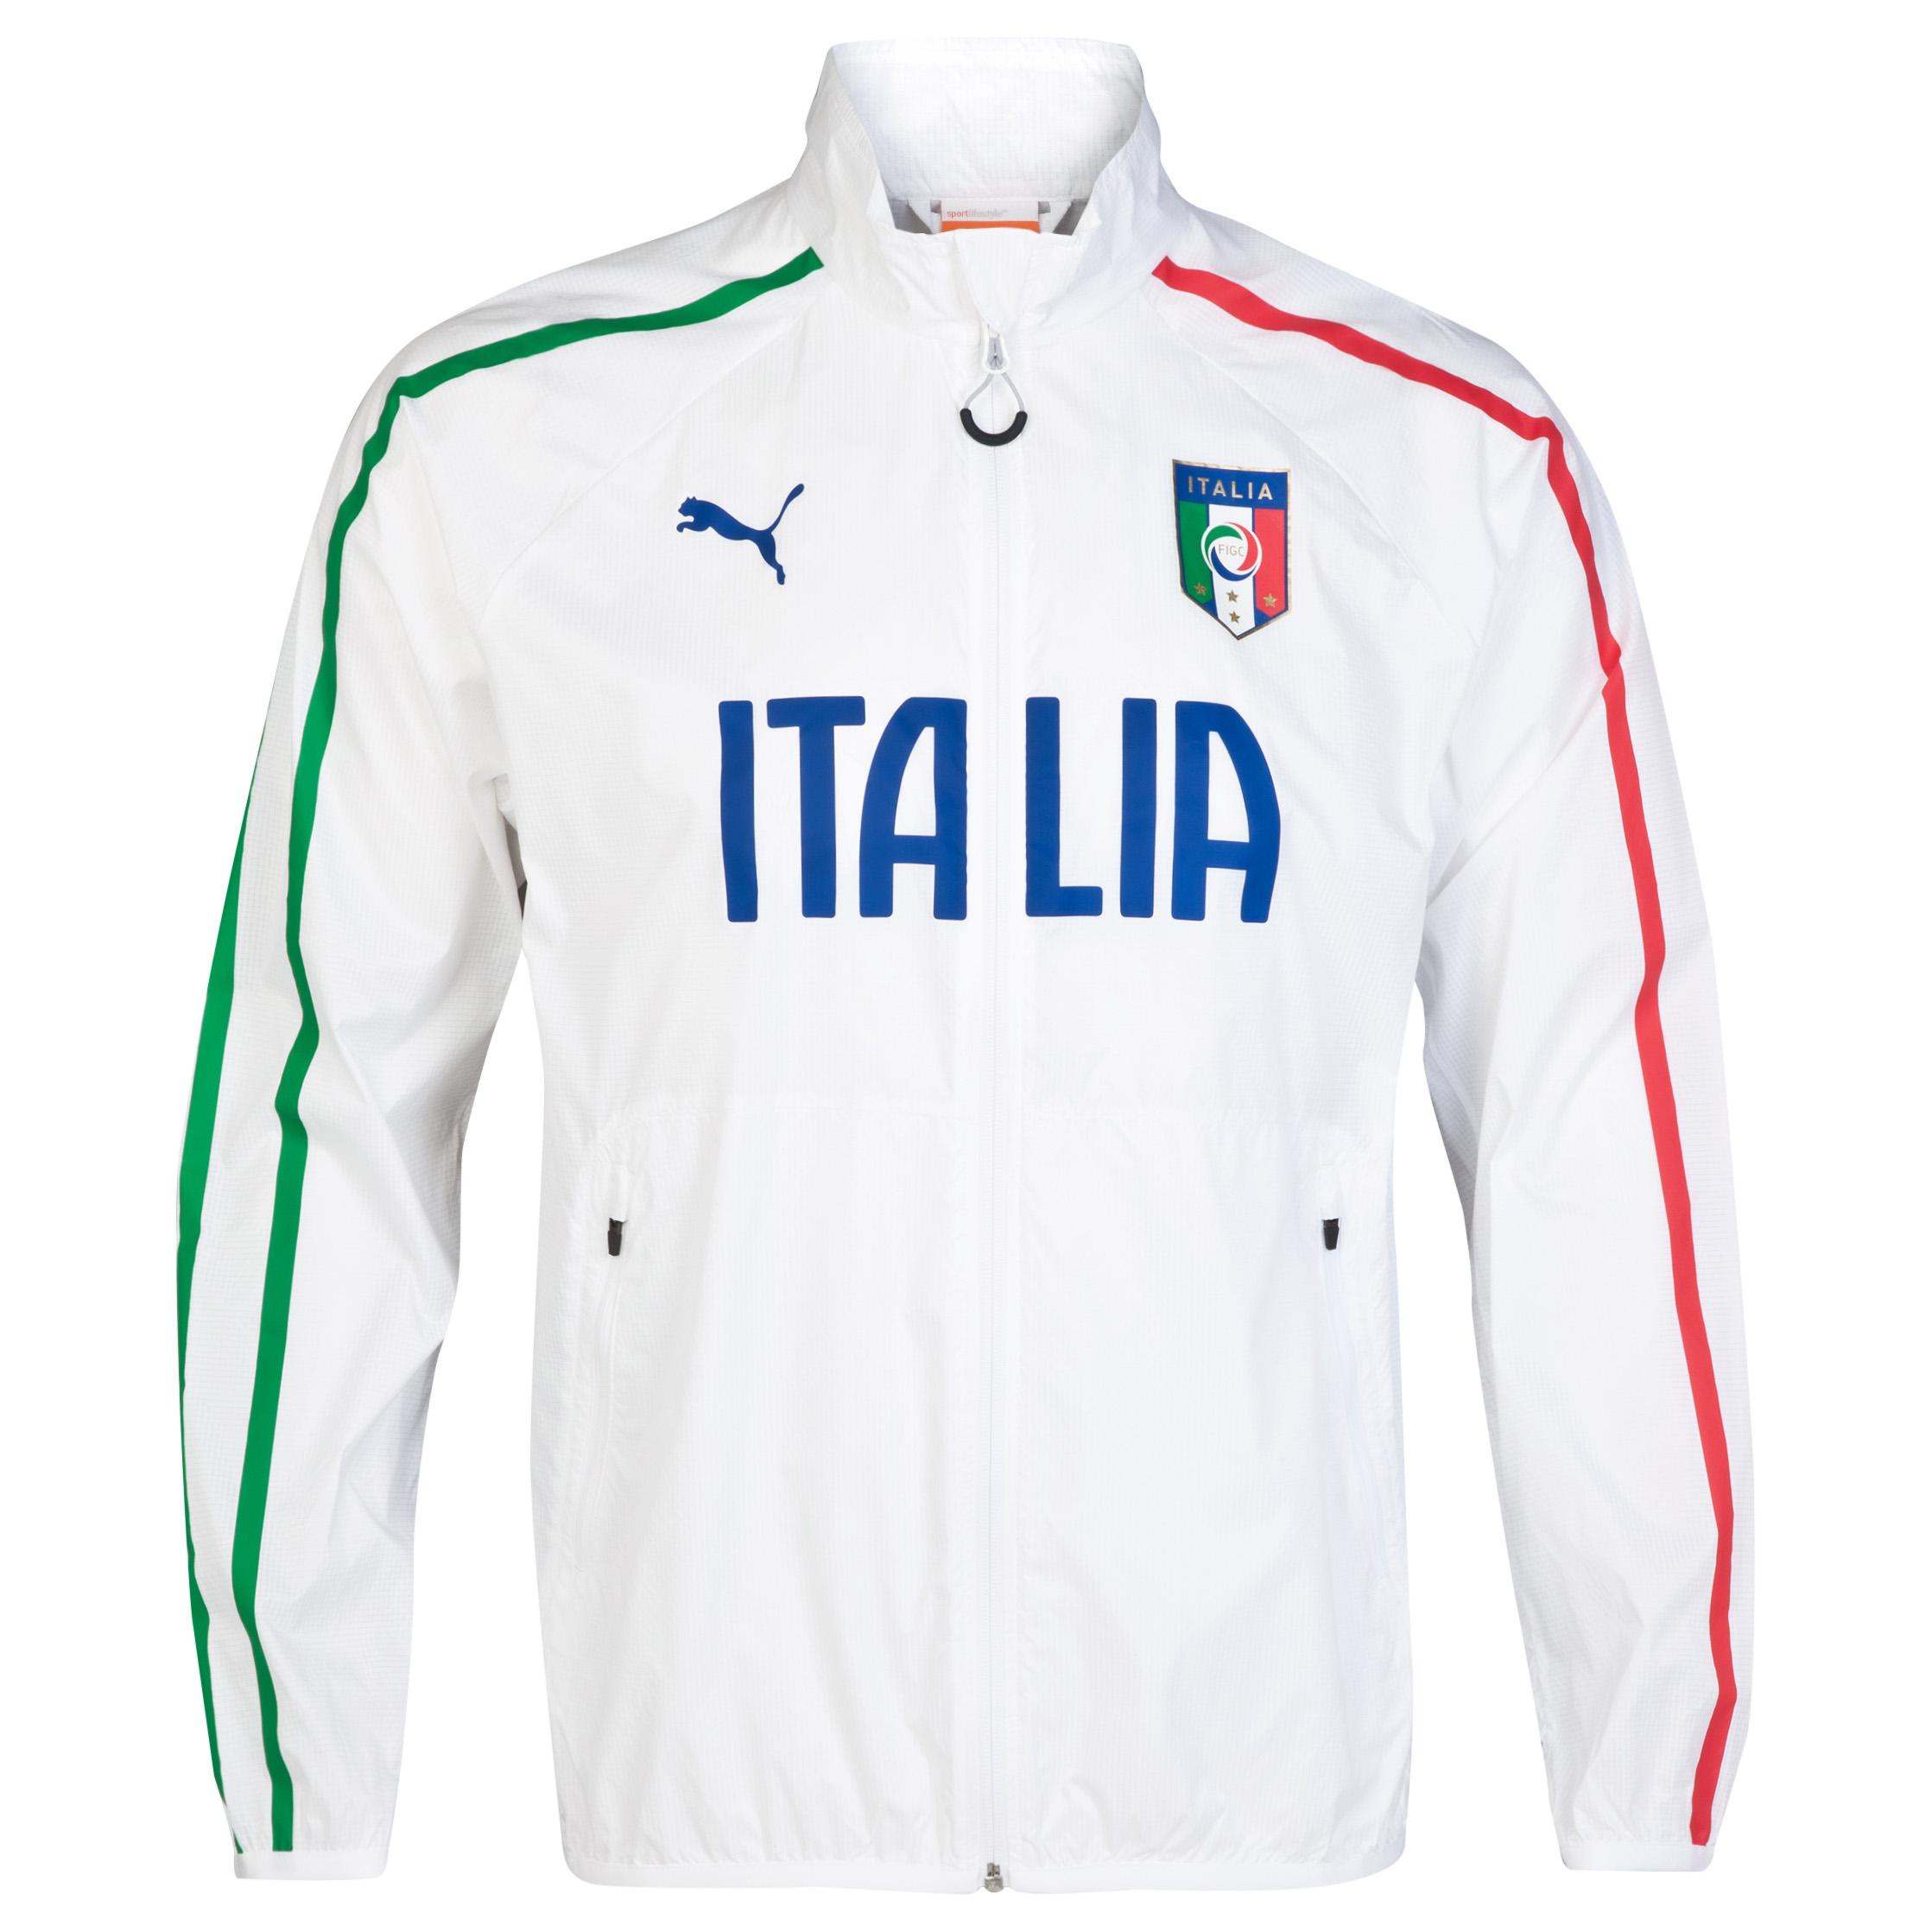 Italy Walkout Jacket -White